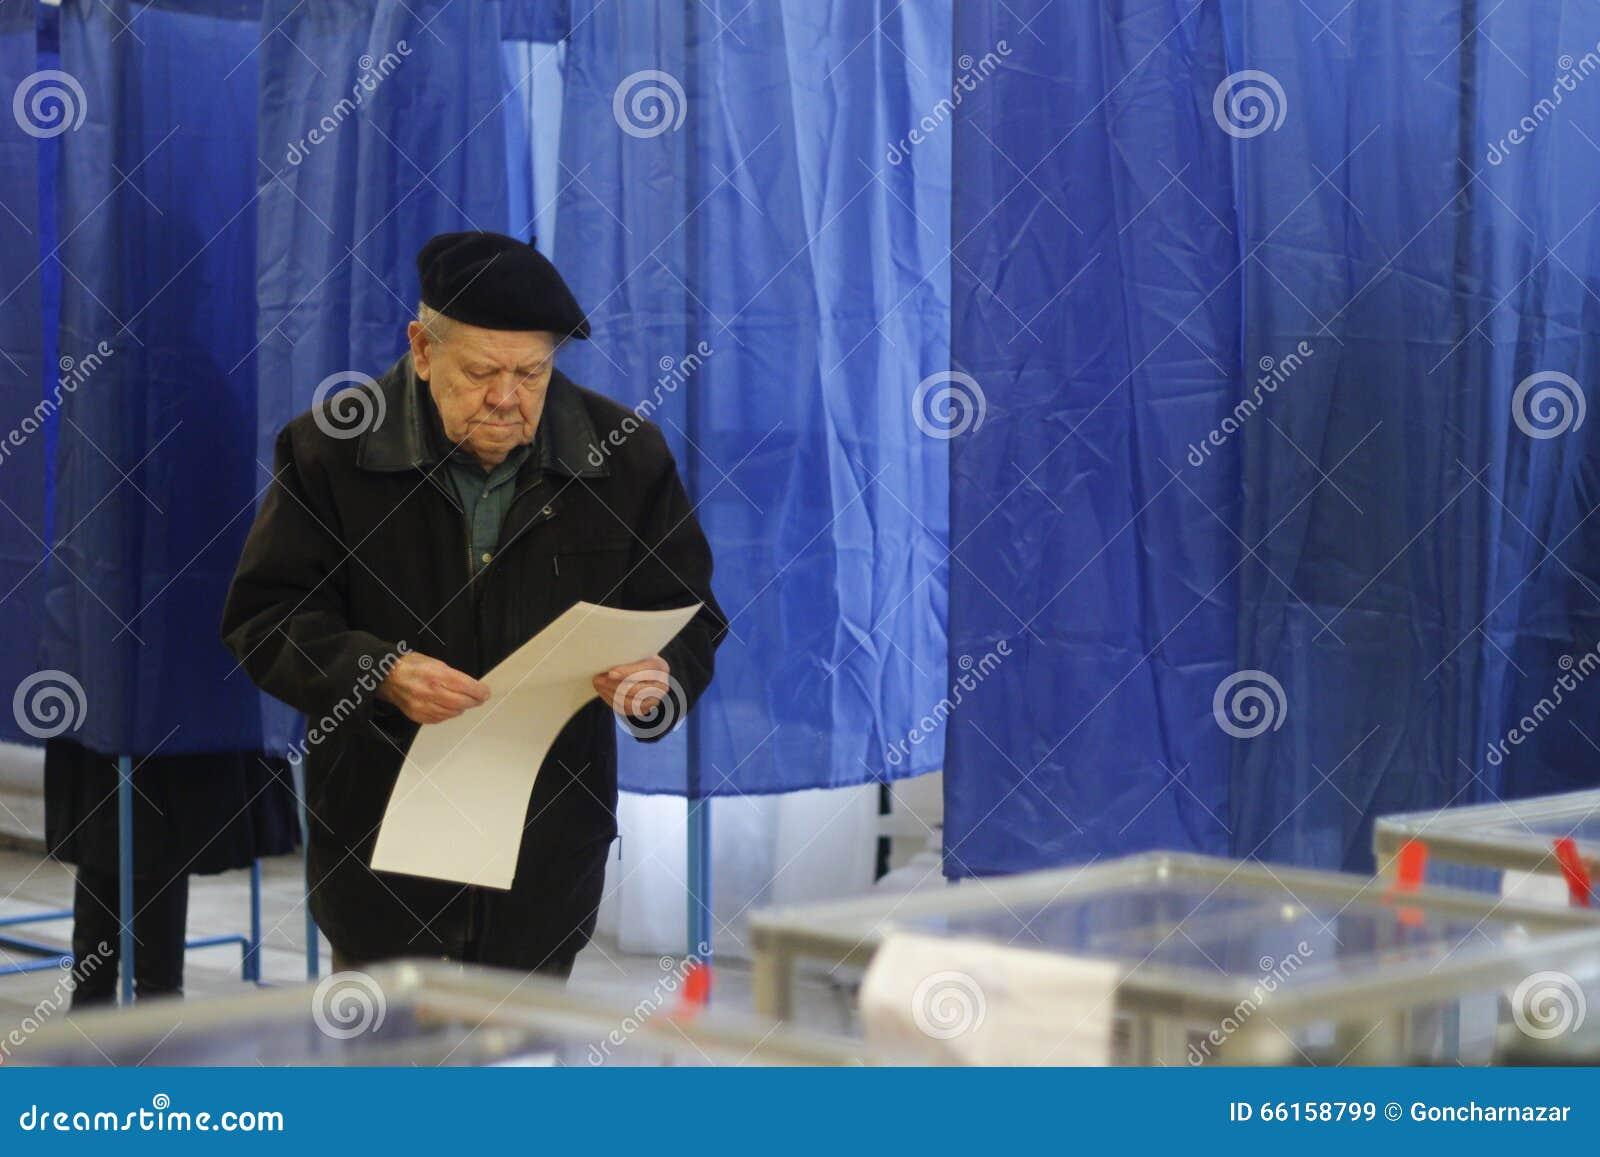 KIEV, UCRAINA - 25 ottobre 2015: Elezioni locali regolarmente prevedute in Ucraina